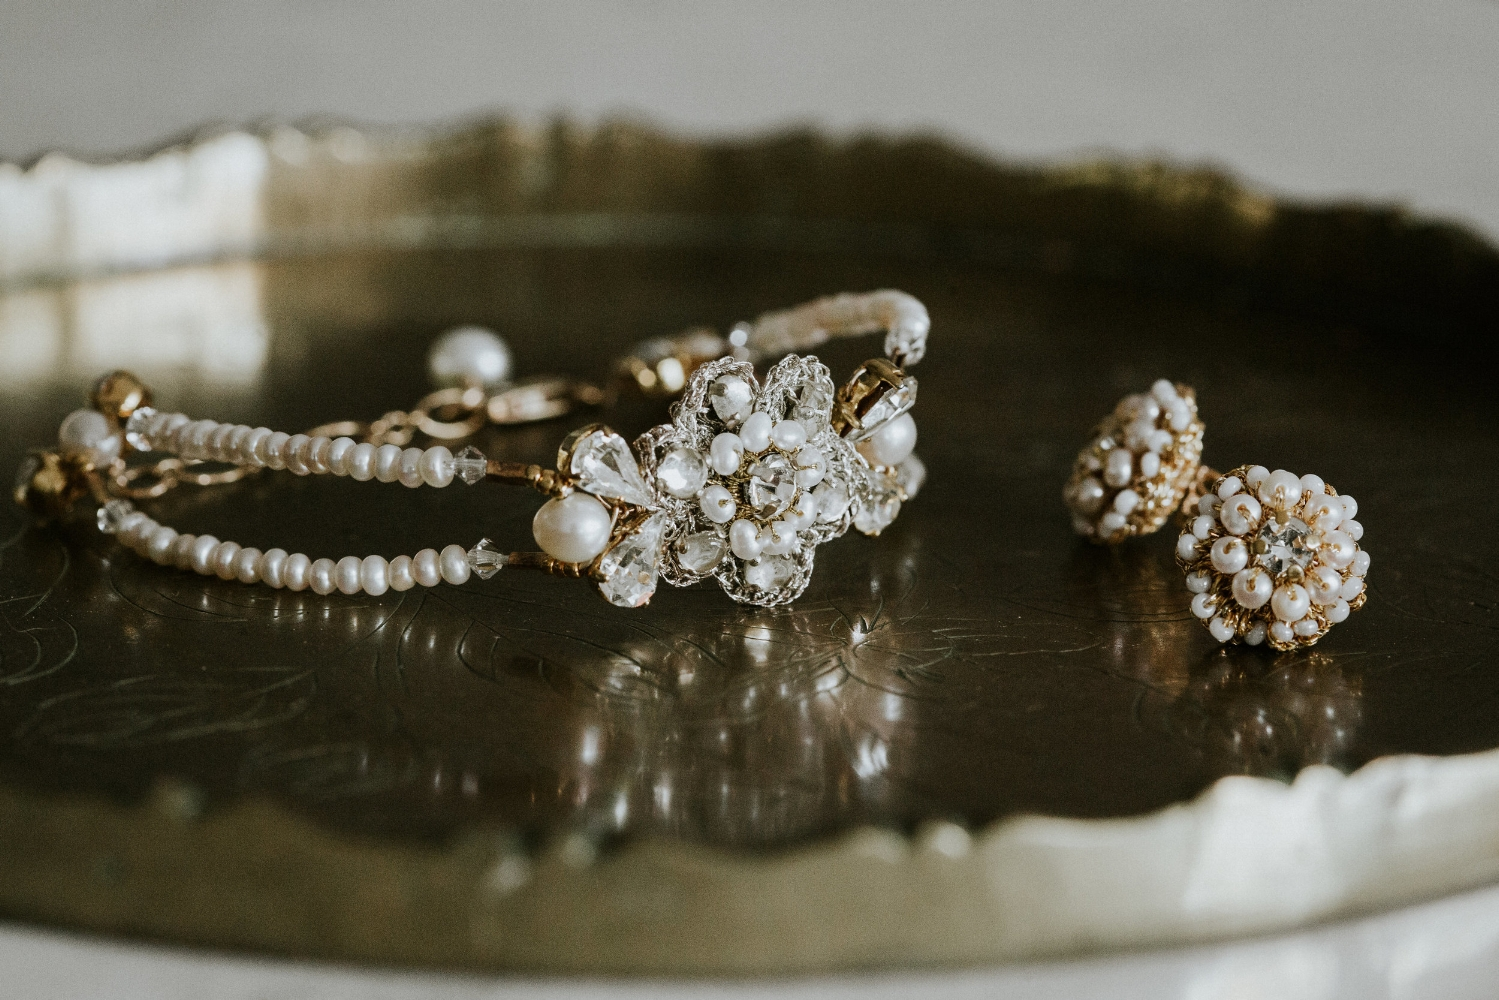 Edera Jewelry Blog: Bohemian Gold & Pearl Wedding Earrings and Bracelet